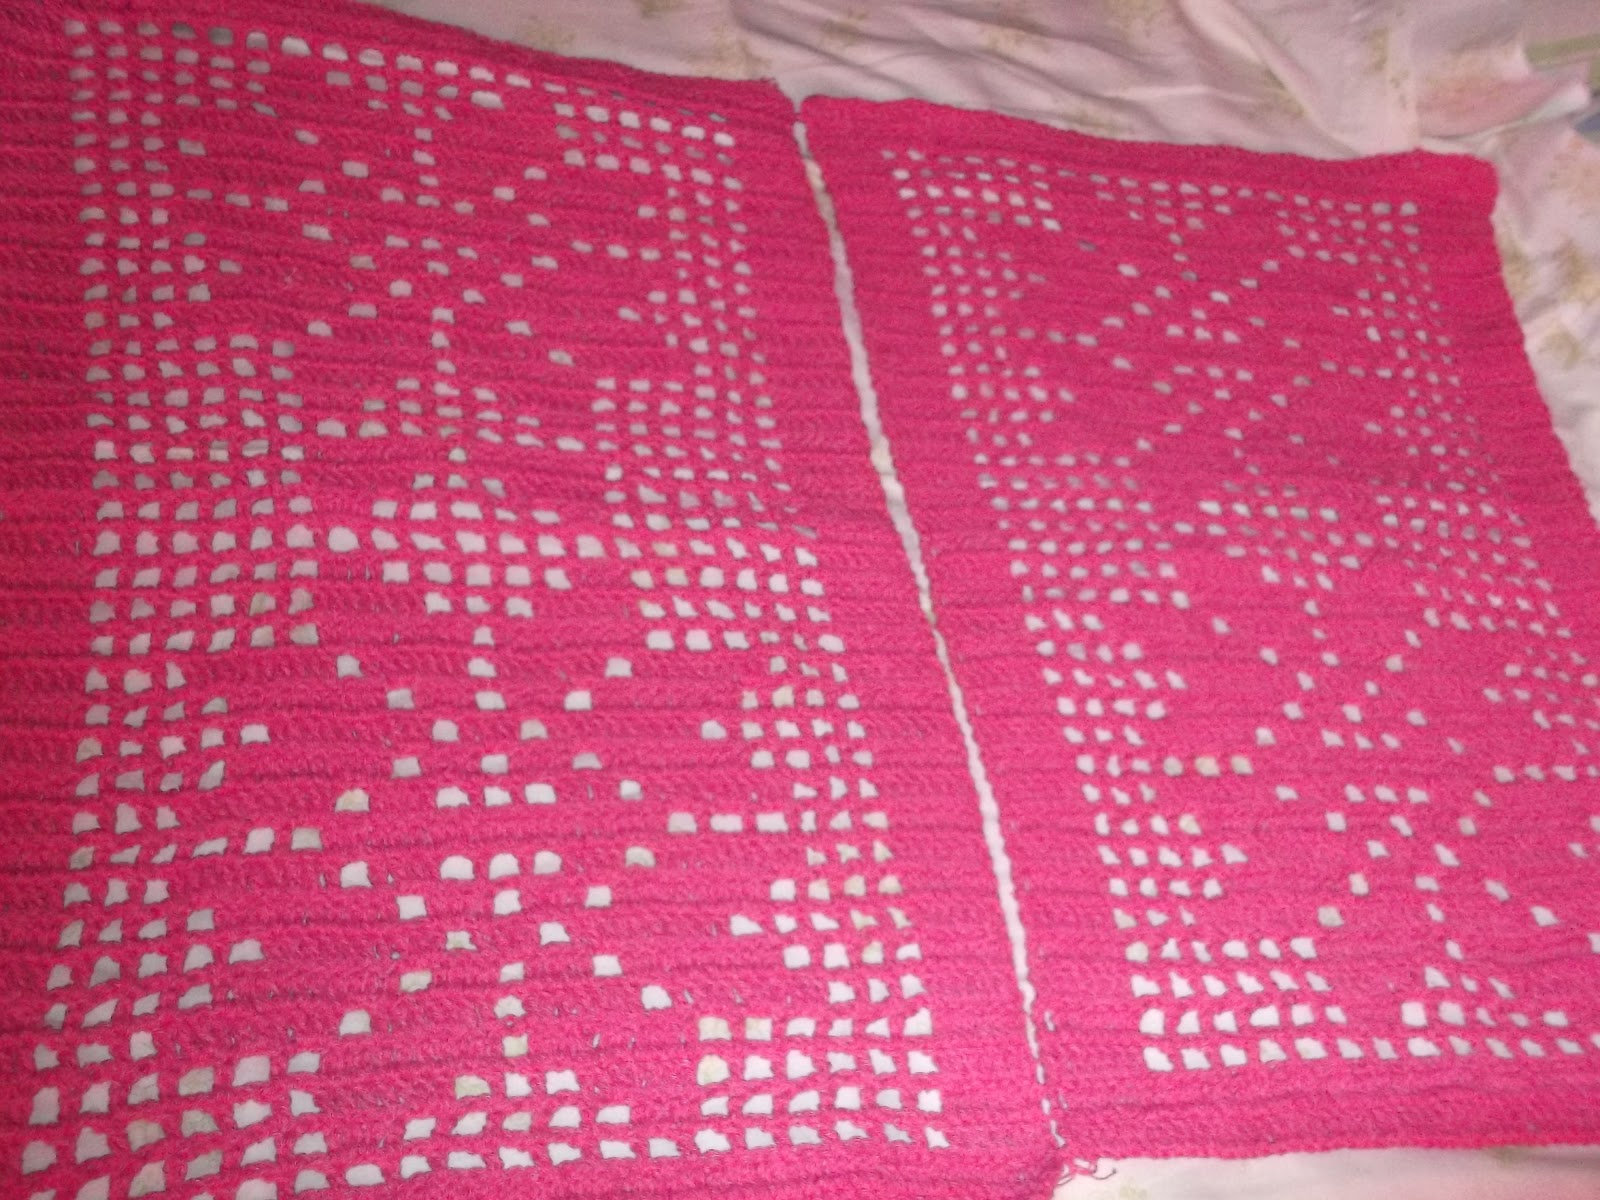 marcia tric e croch tapetes em barbante pink. Black Bedroom Furniture Sets. Home Design Ideas